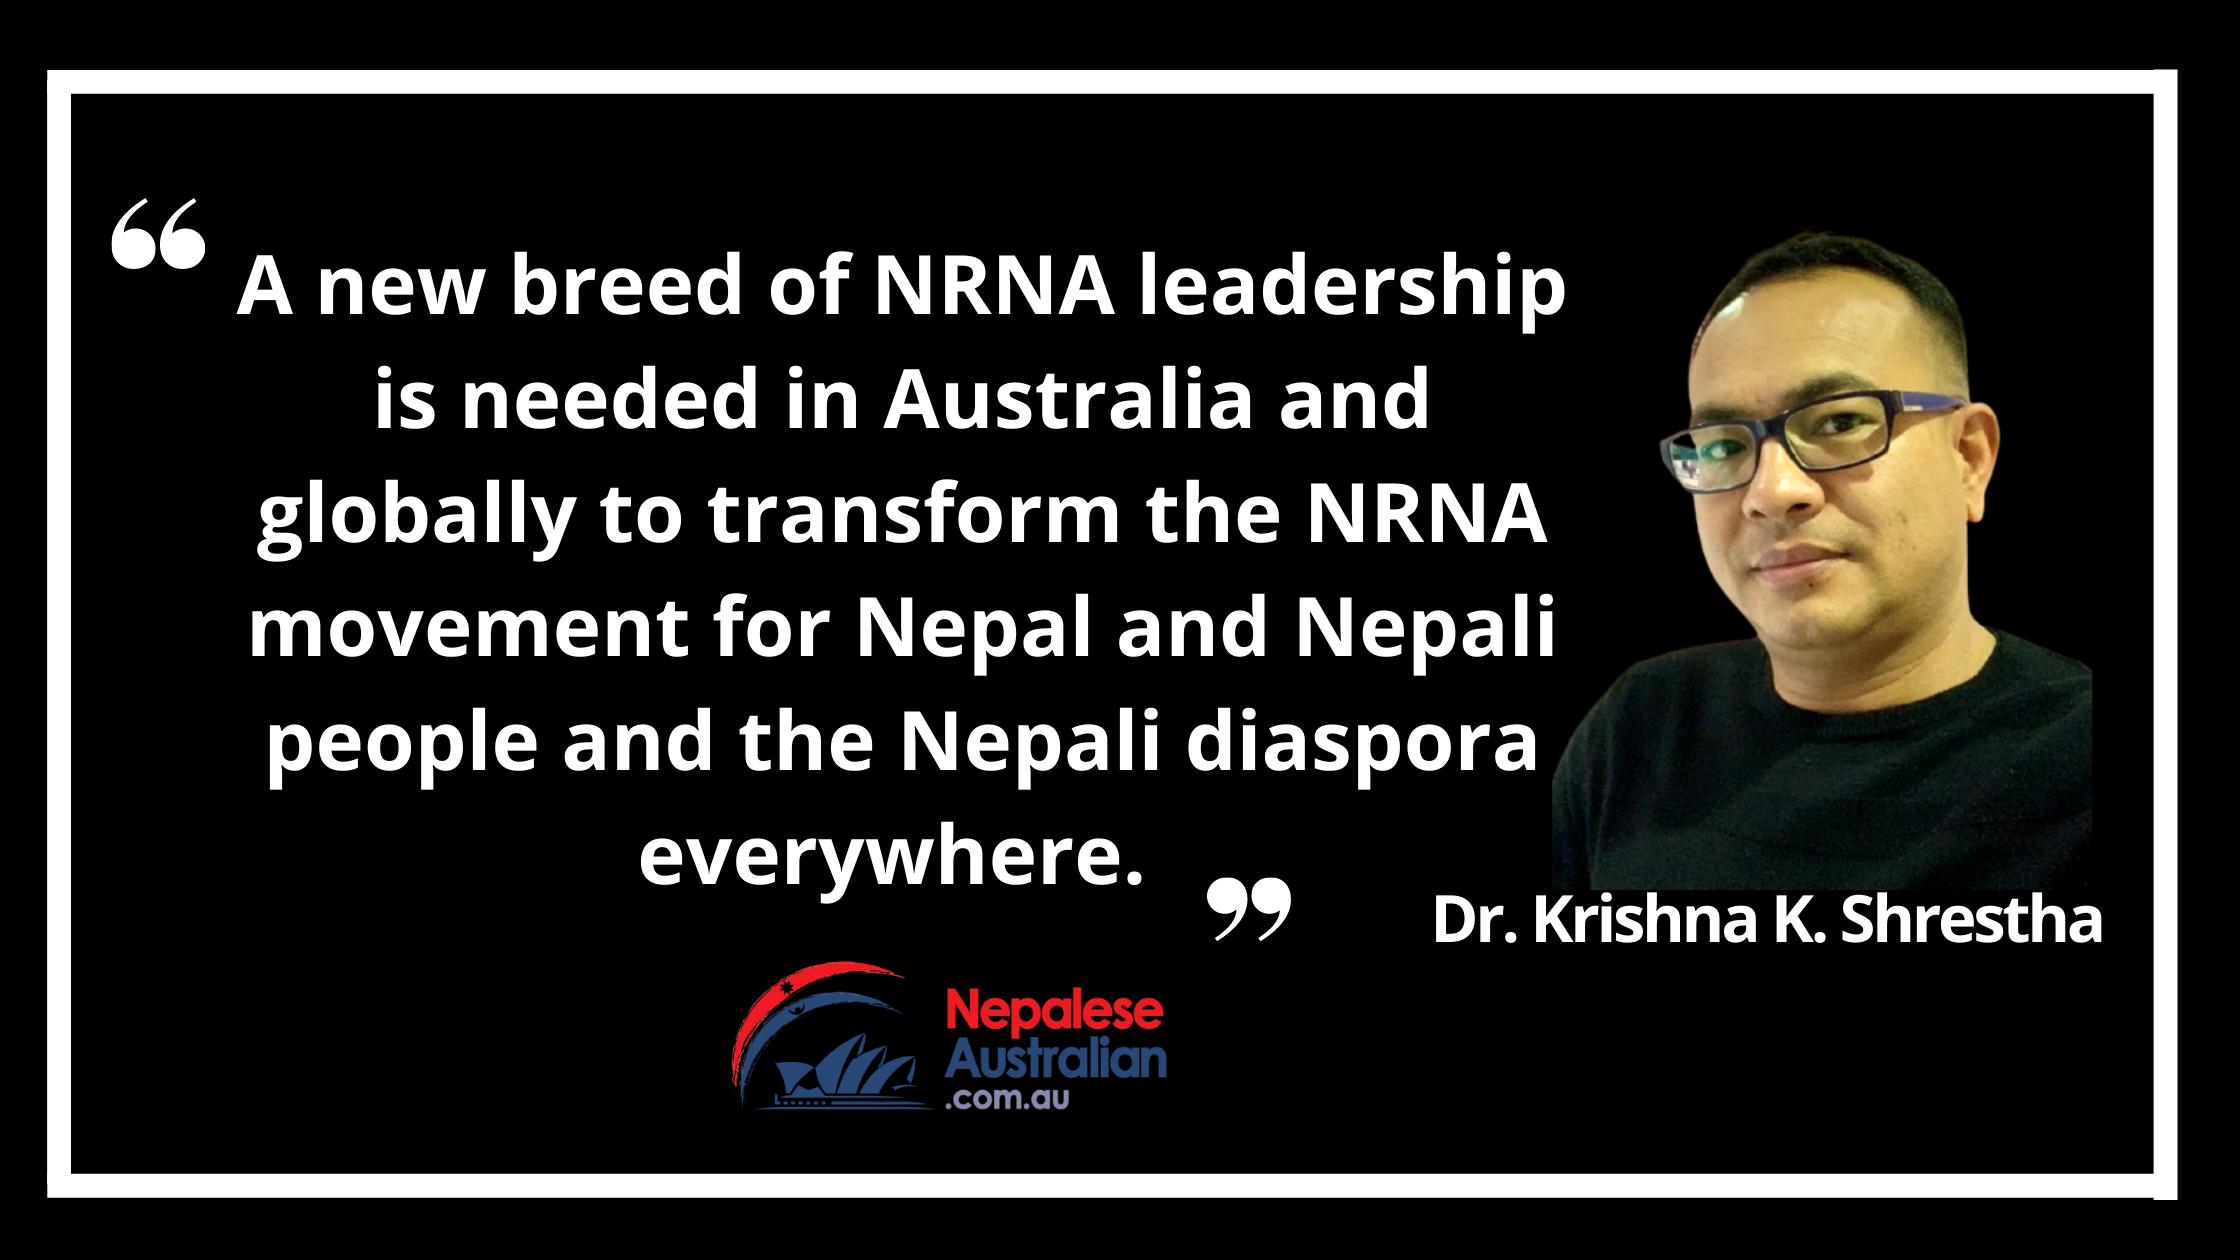 Dr Krishna K. Shrestha Associate Professor of Global Development University of New South Wales, Sydney